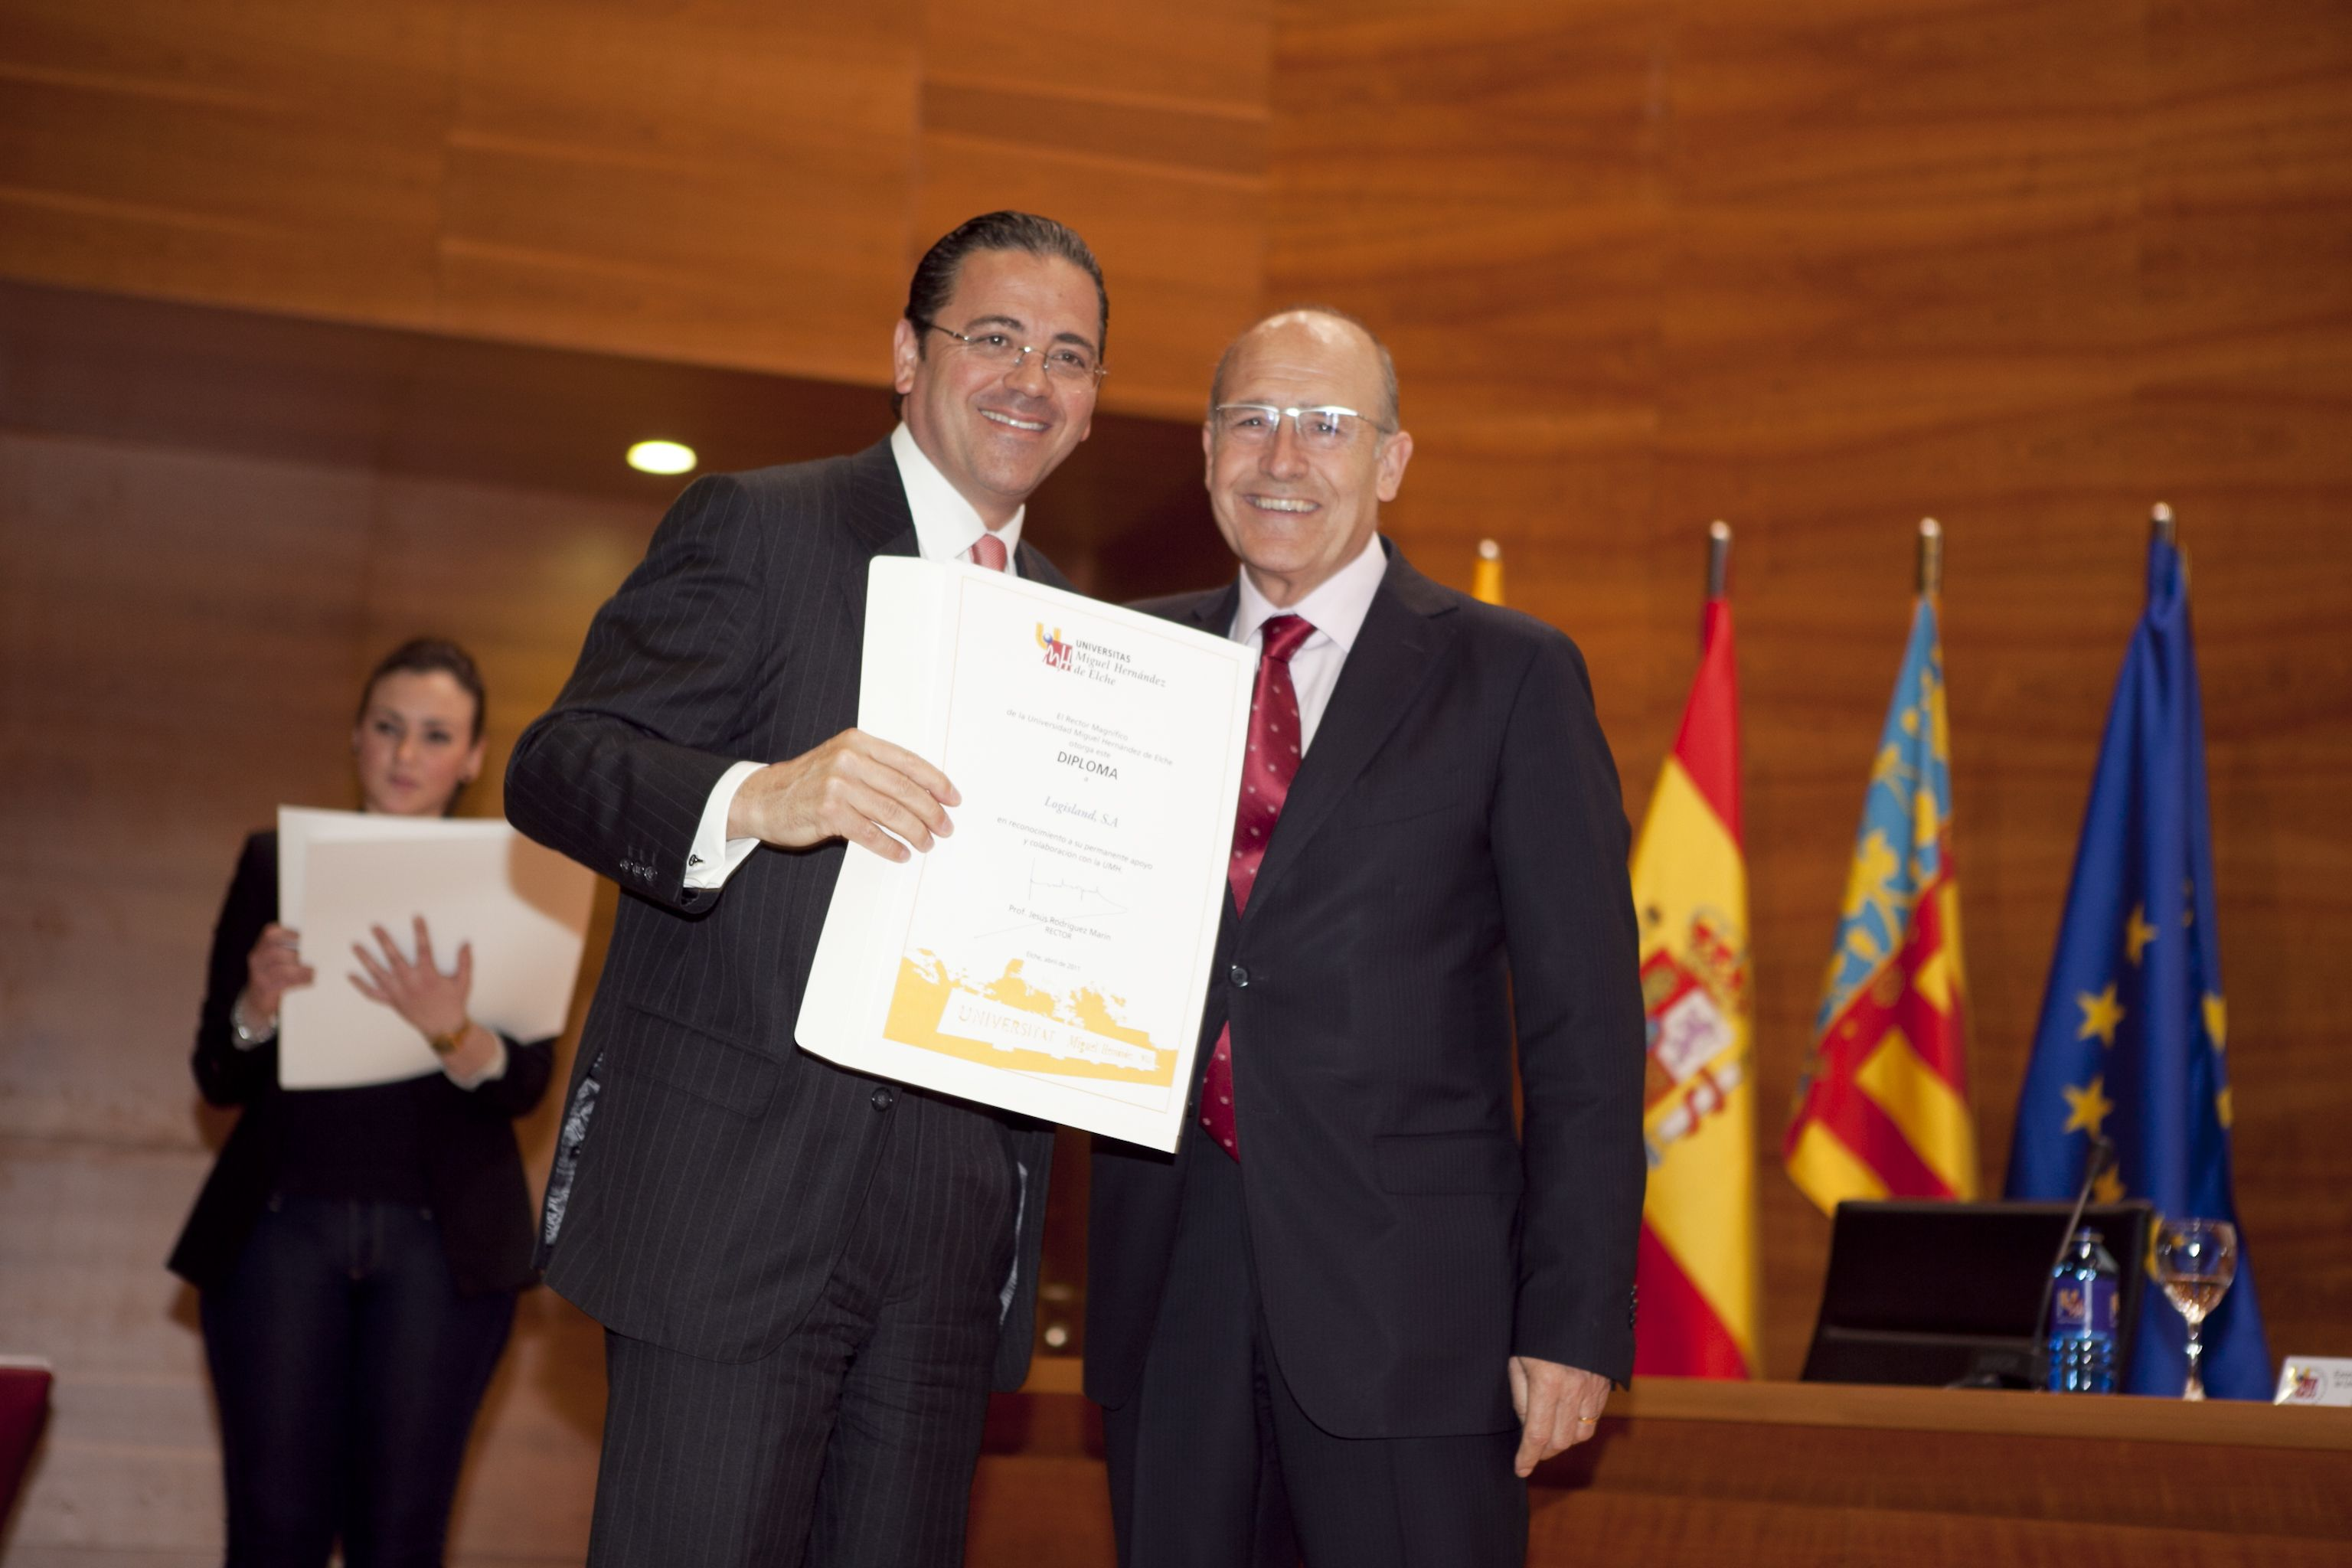 umh-diplomas-rector_mg_6794.jpg